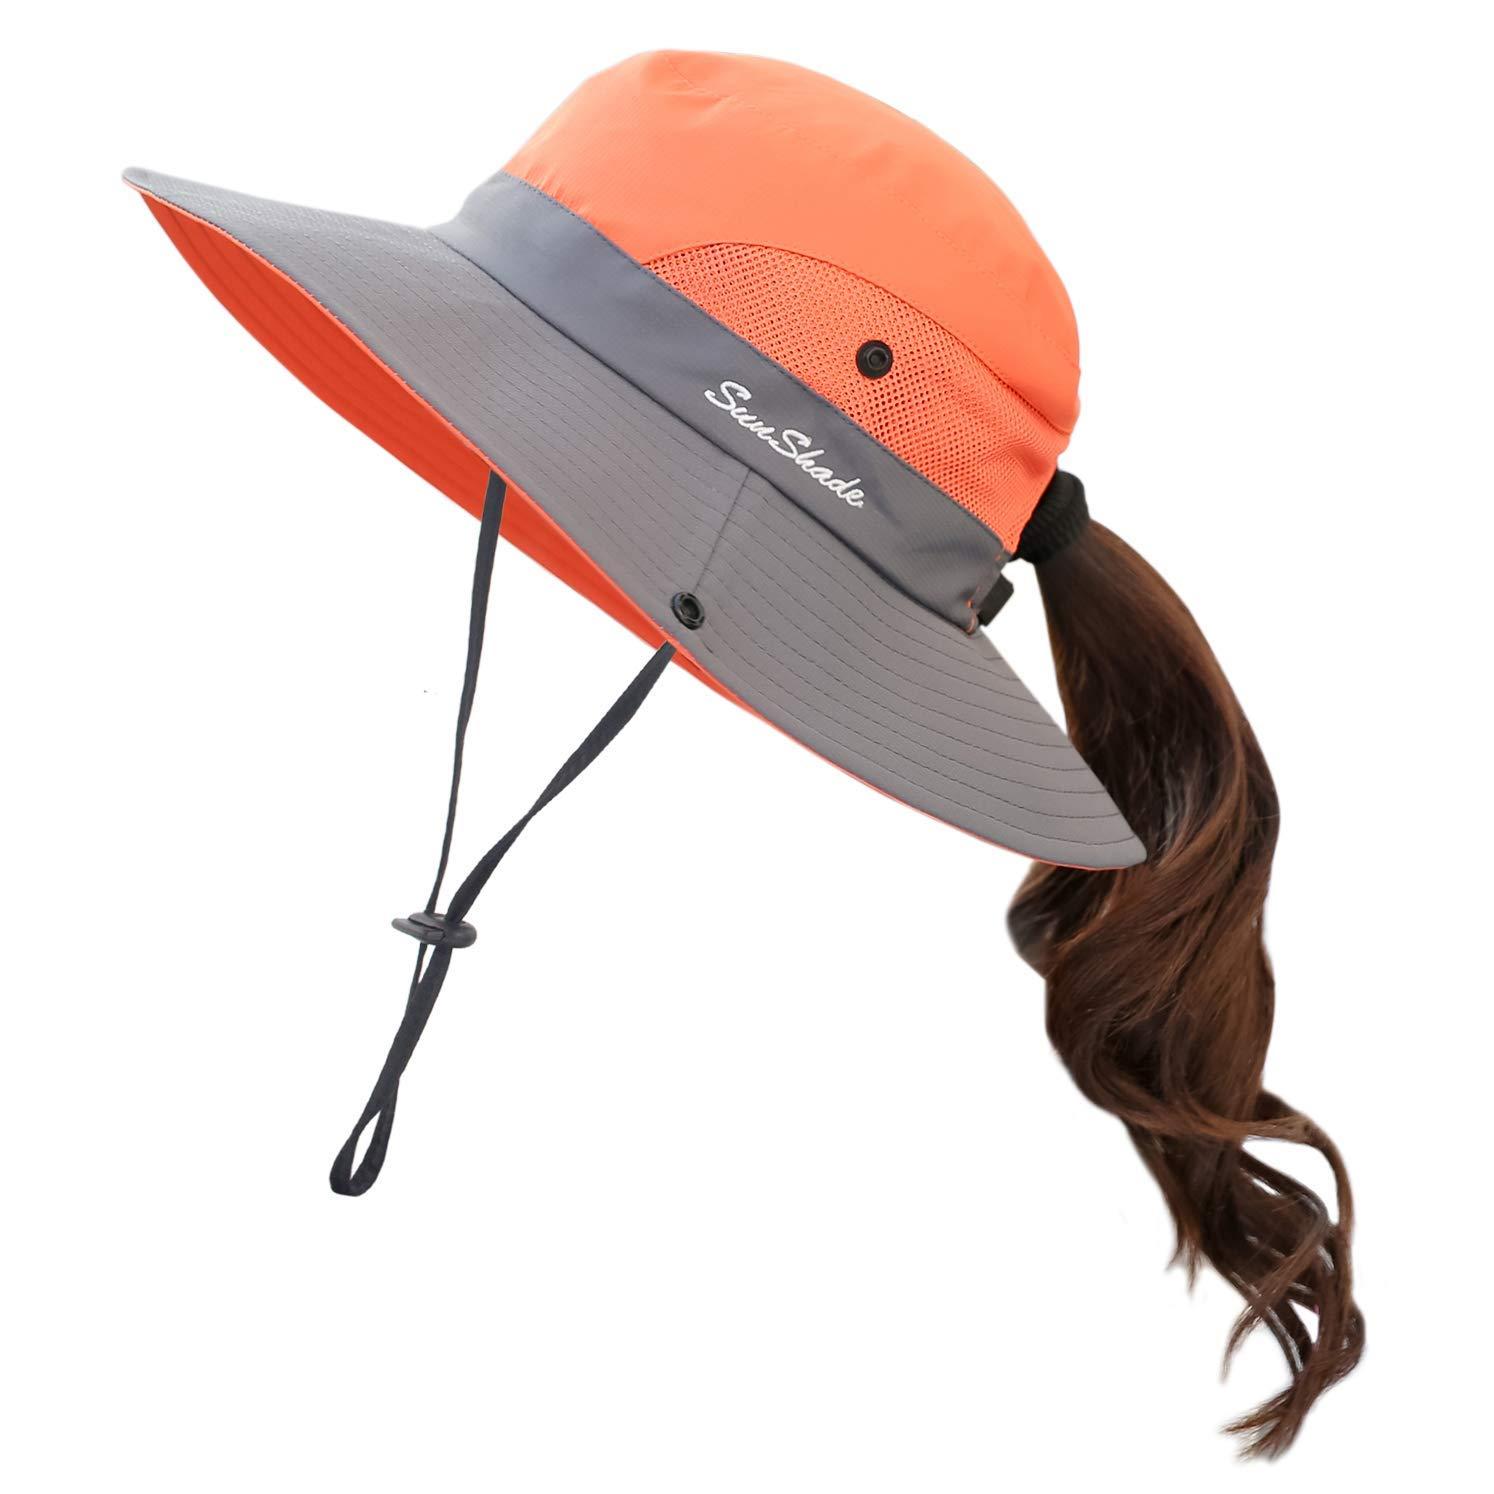 5931da4af Women's Summer Sun UV Protection Hat Foldable Wide Brim Boonie Hats for  Beach Safari Fishing